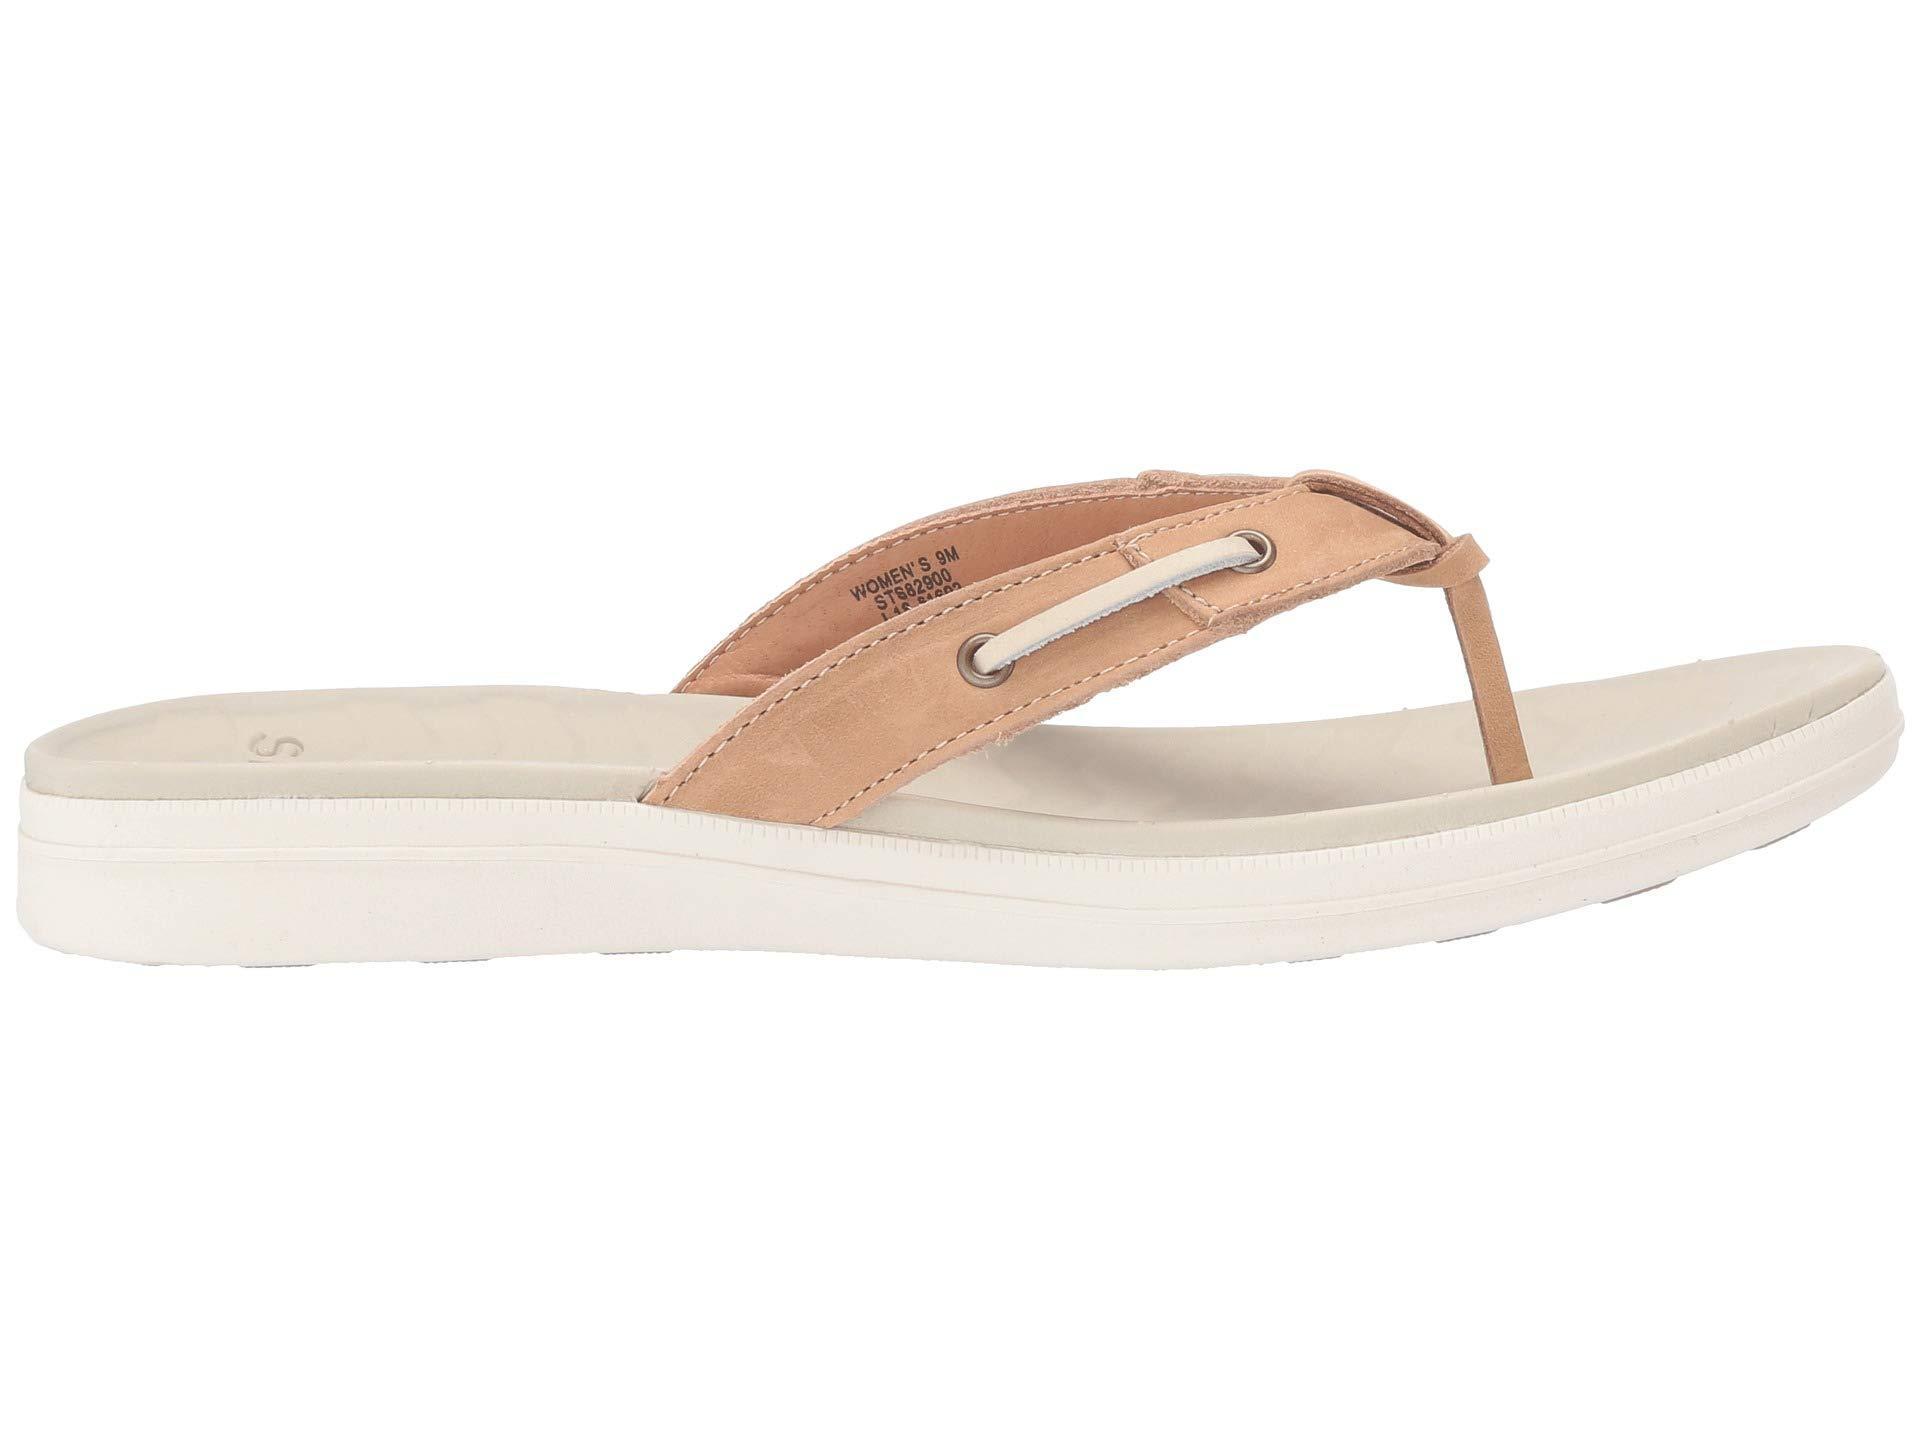 Sperry Womens Adriatic Thong Skip Lace Seersucker Sandal 9 M White//White